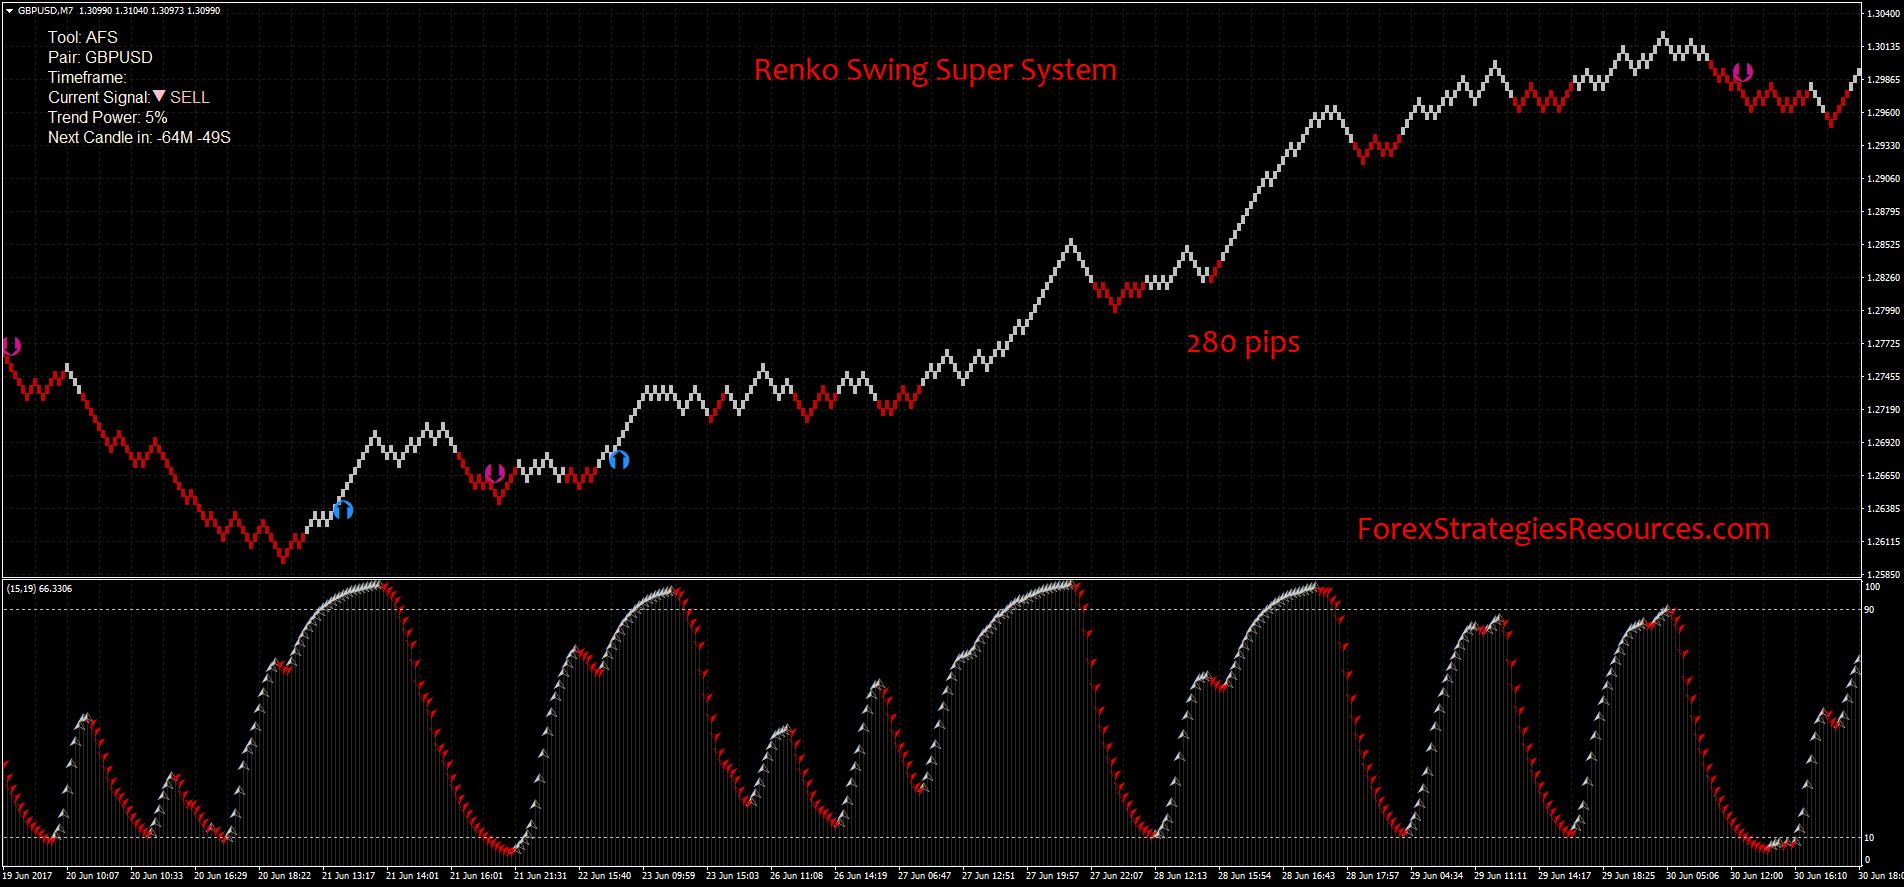 Renko Swing Super System - Forex Strategies - Forex Resources